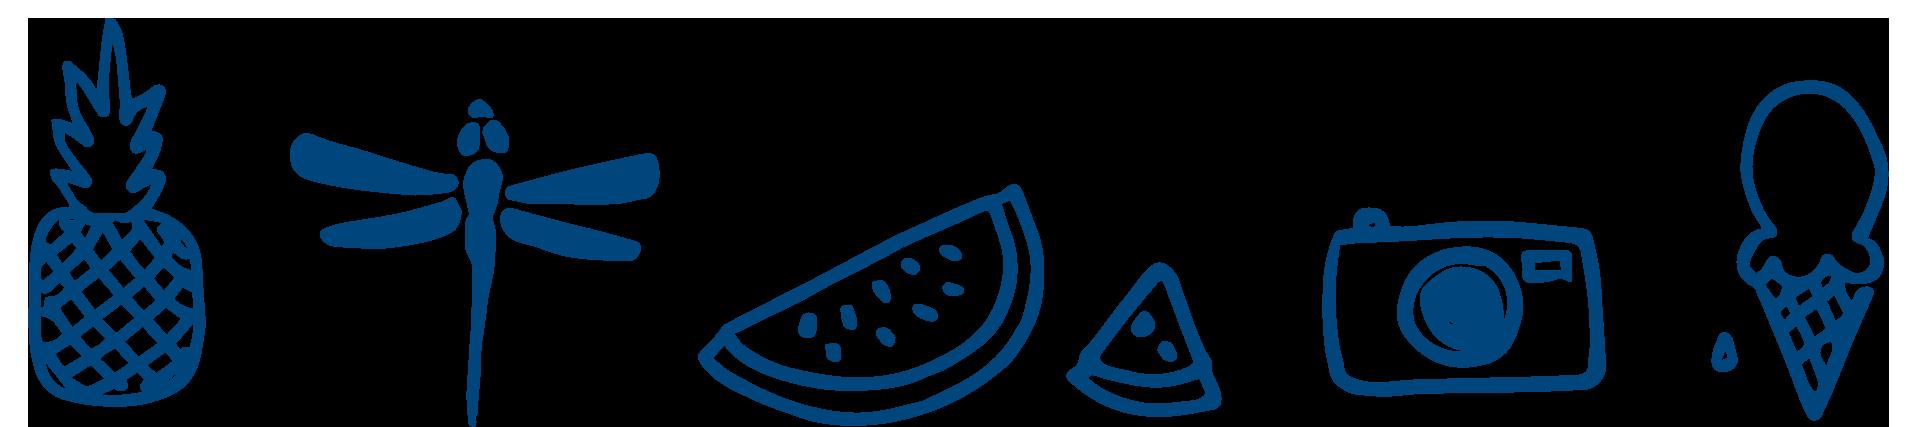 bartaco brand icons